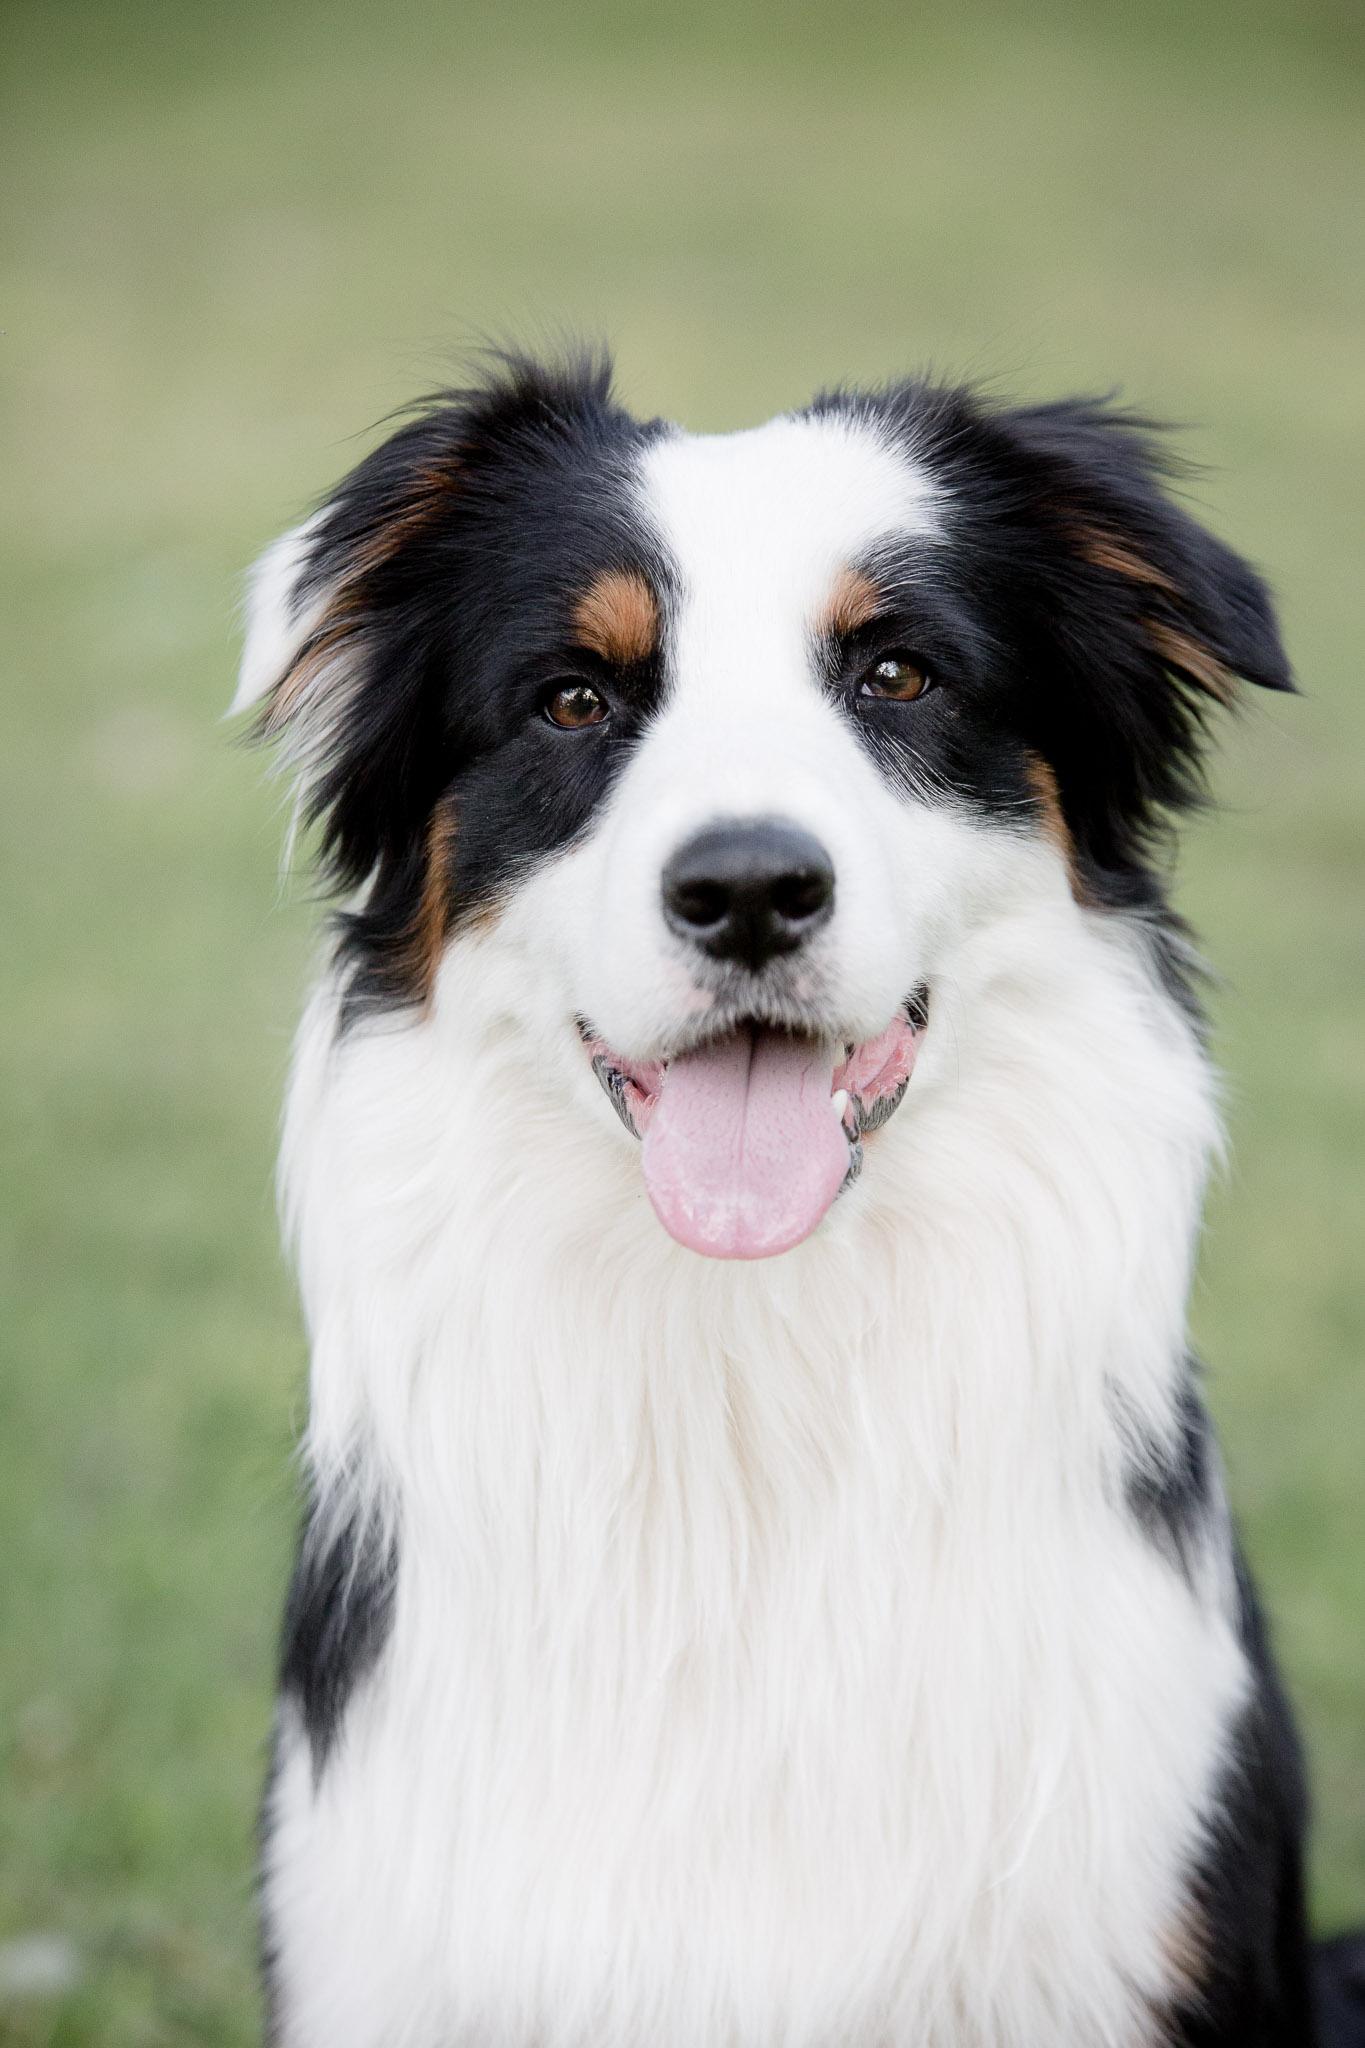 Annatarfoto hundfotografering djur hund Karlsnäsgåden Ronneby